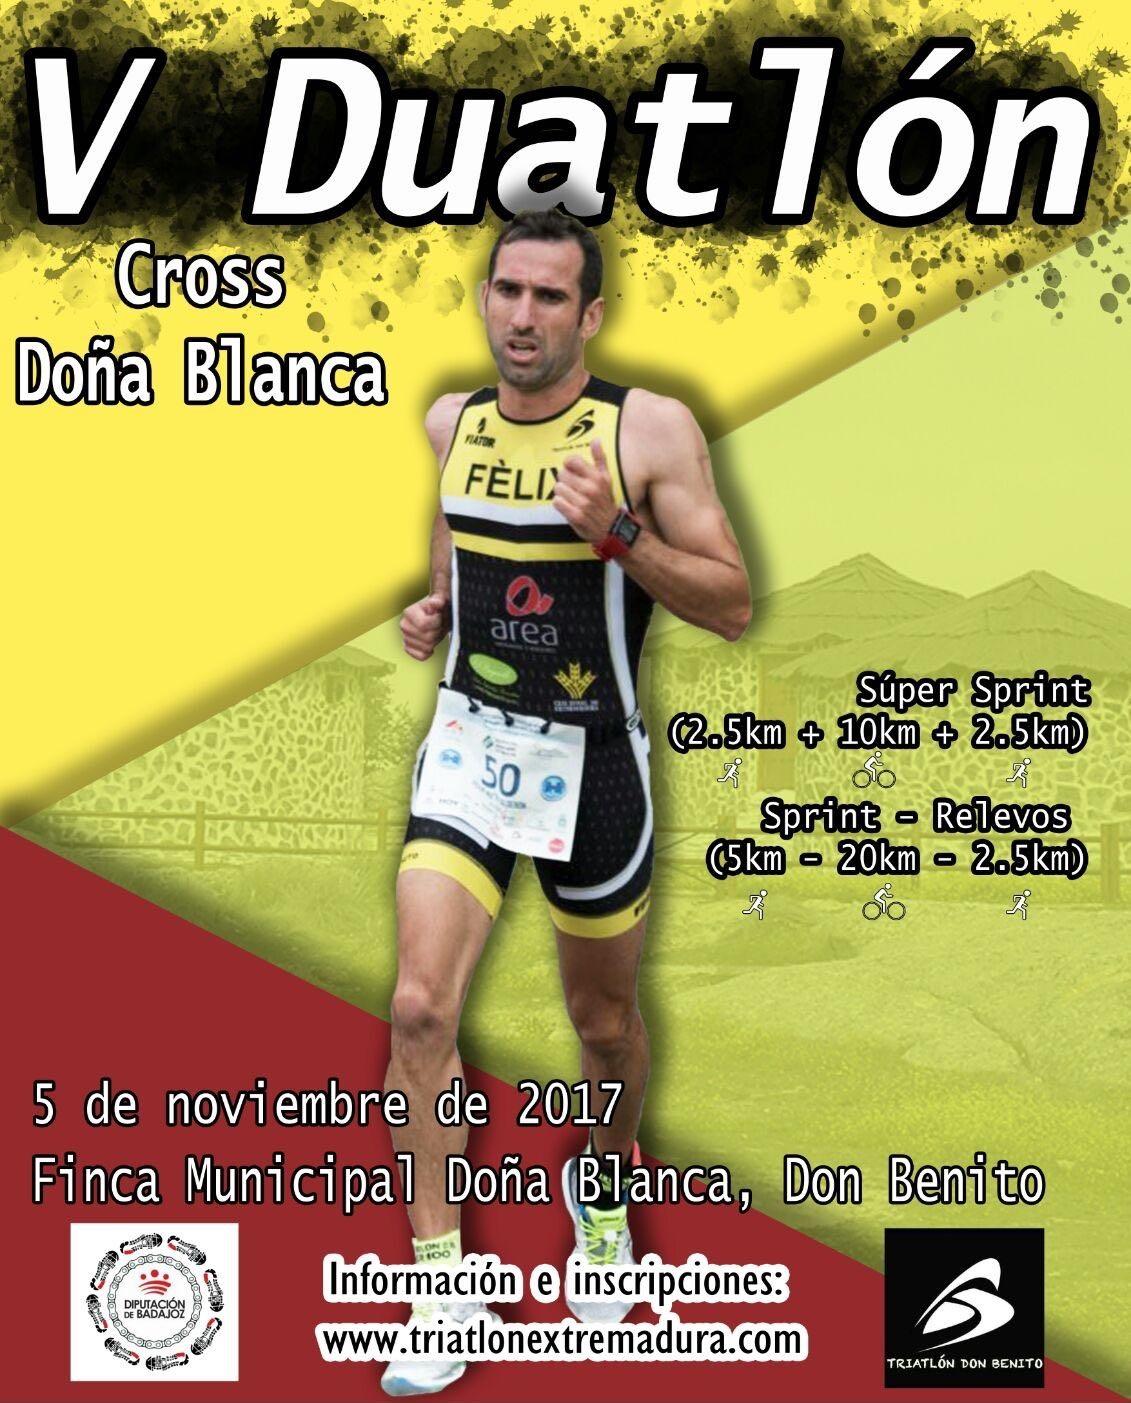 El V Duatlón Cross se celebrará este domingo en Don Benito